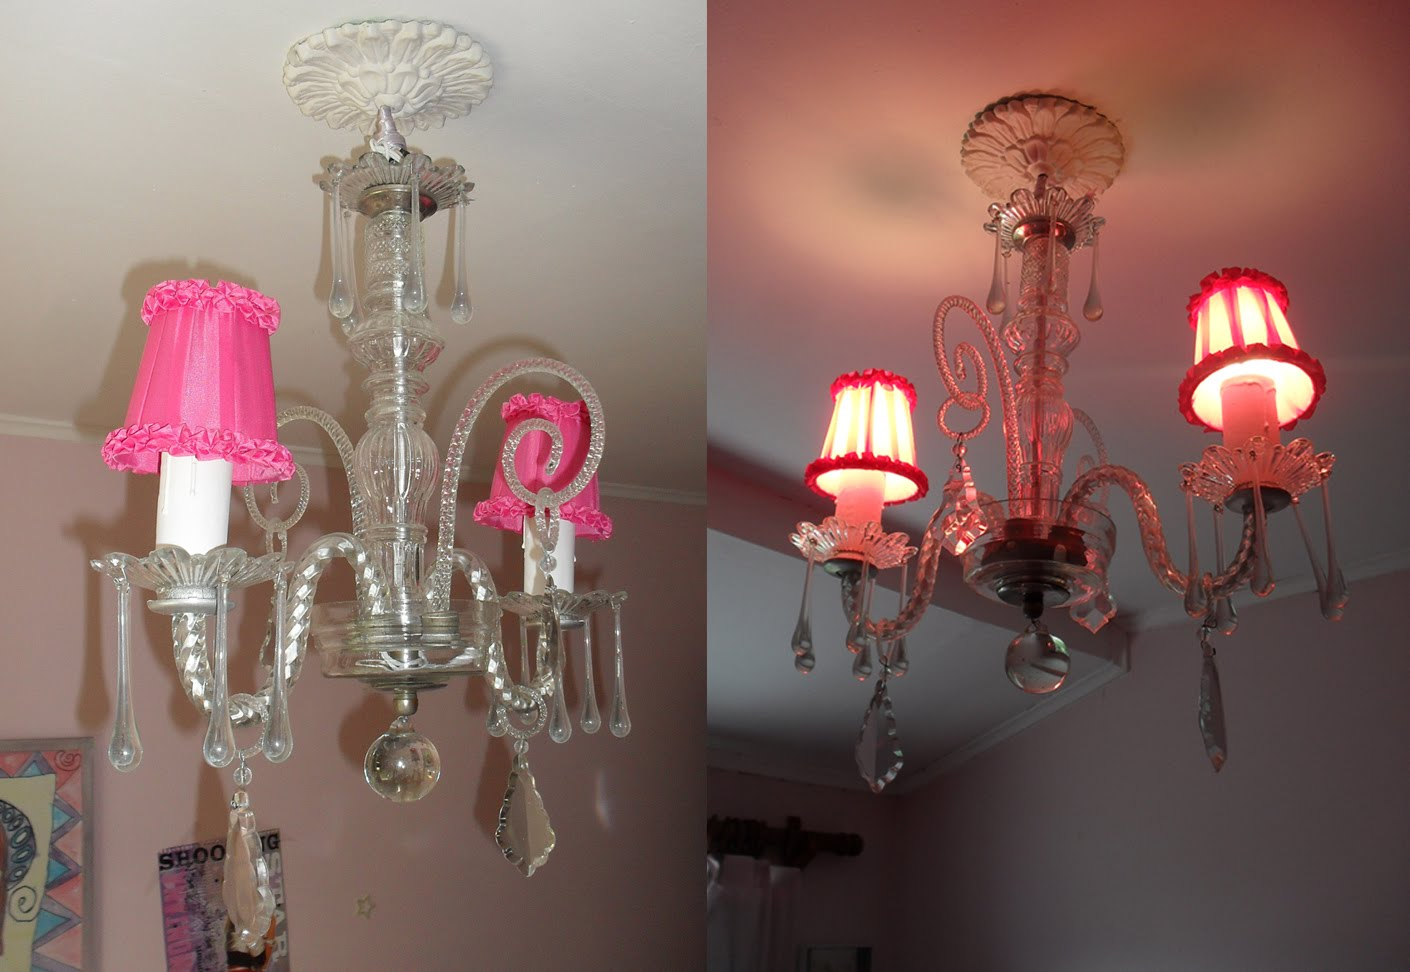 Pantallas para lamparas de techo arquitectura de lamparas - Pantallas de lamparas ...